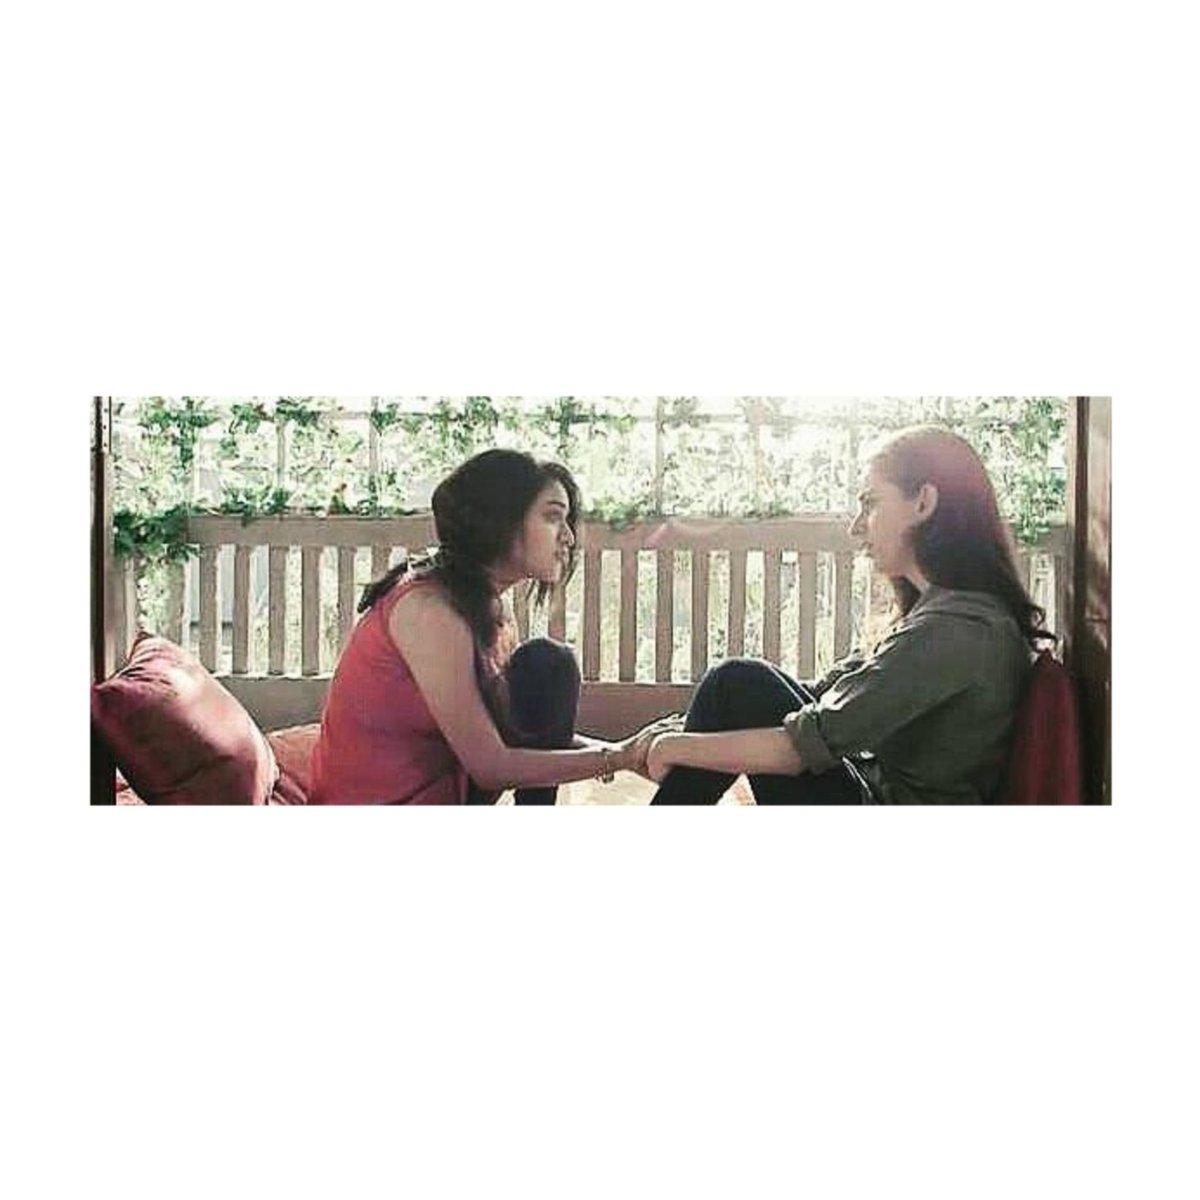 https://t.co/zaRO4nogEq  Another write-up on Radhika & Samaira's friendship from Dosti Yaariyan Manmarziyan serial @sehgal_monica @Kashmira_Irani  #tales #bypuja #writeups #writer #writing #swastikproductions #dostiyaariyanmanmarziyan #manmarziyan #kashmirairani #monicasehgal https://t.co/j3fFNdoZDW